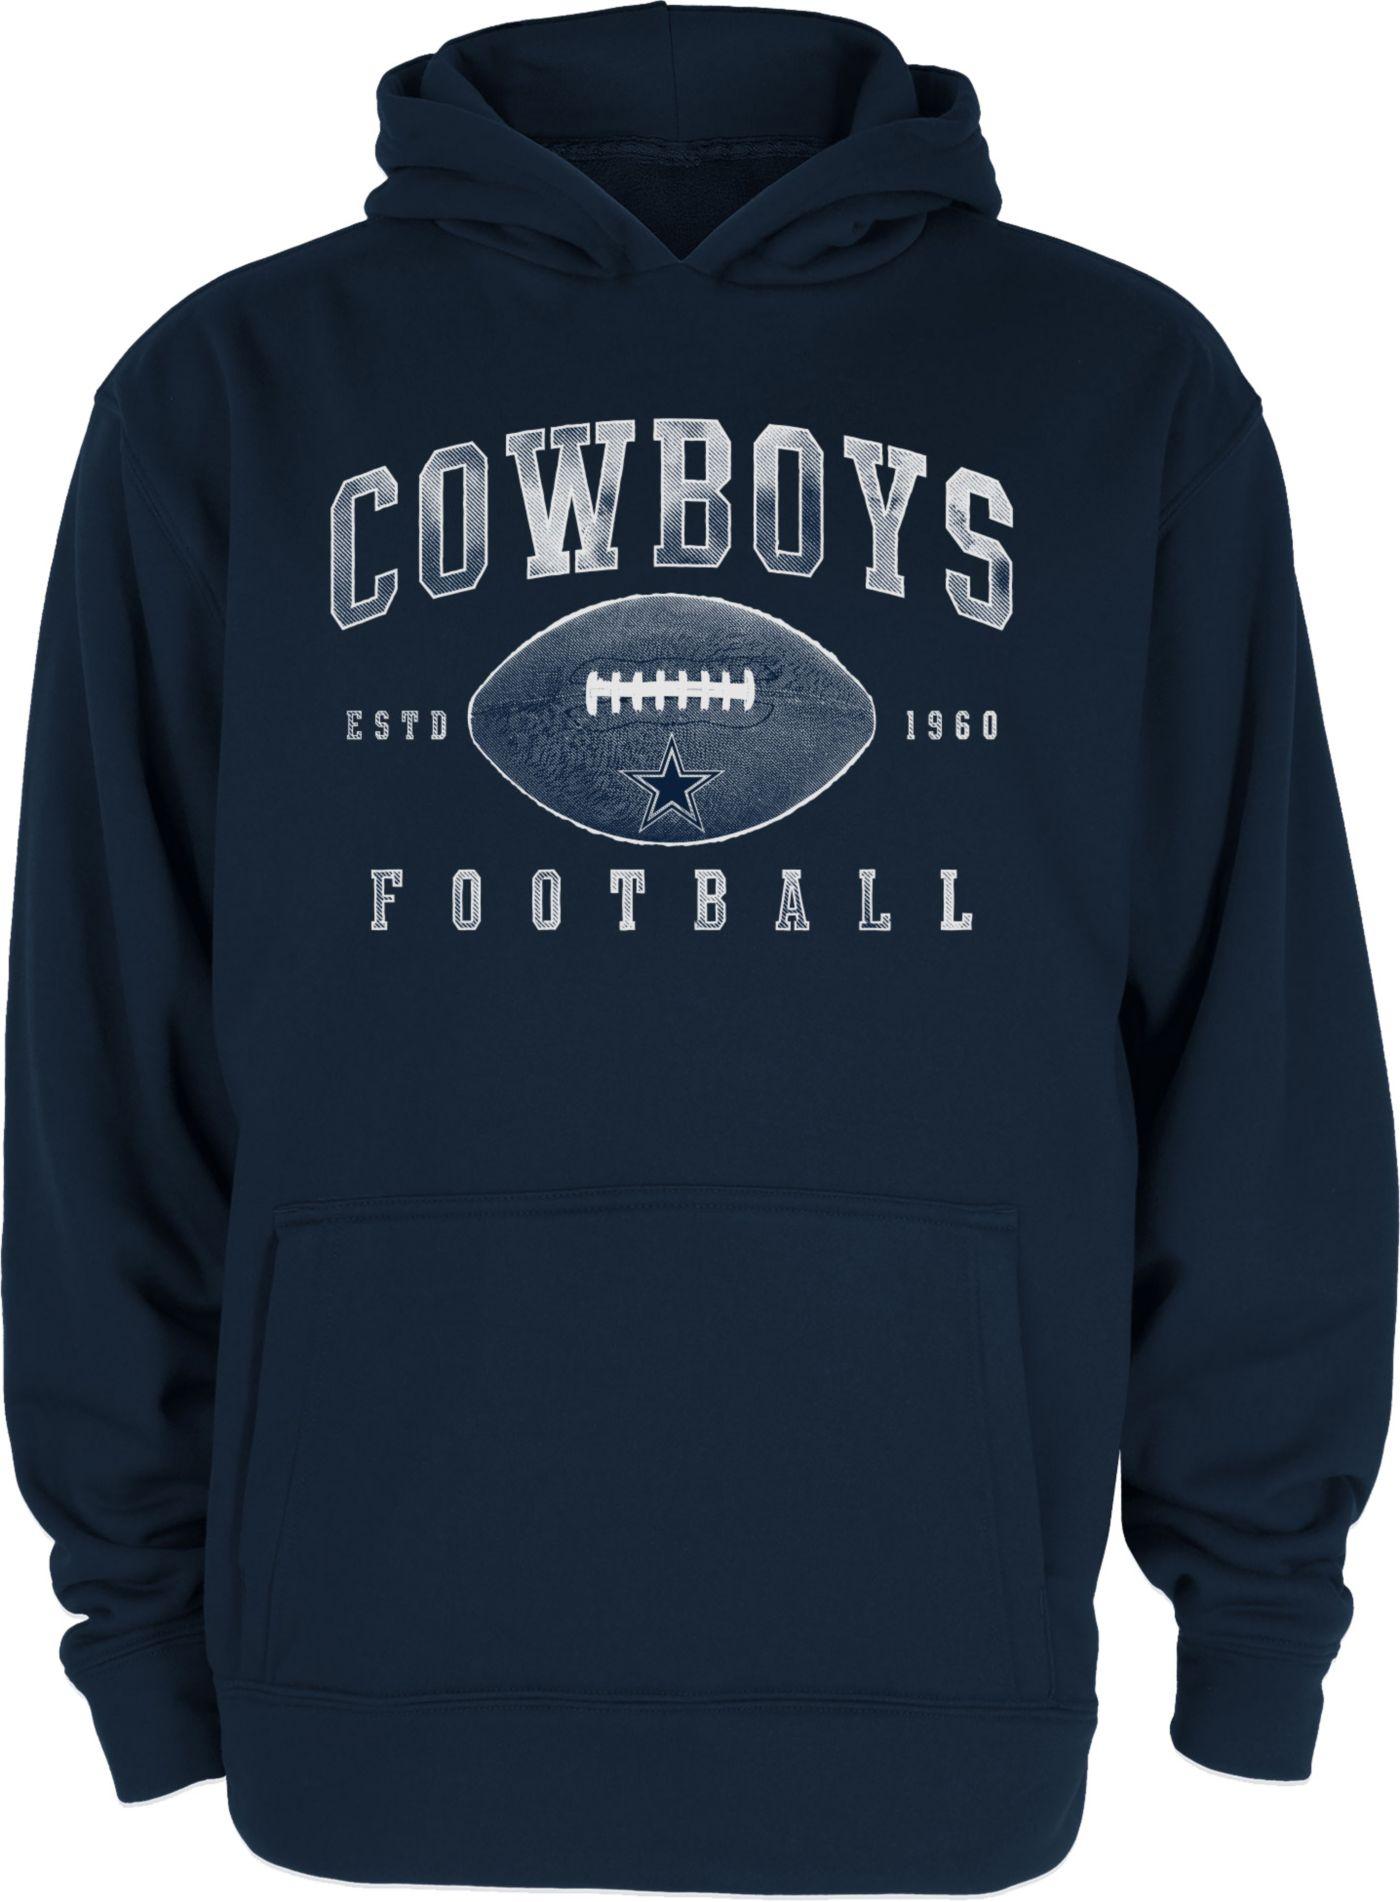 Dallas Cowboys Merchandising Youth Robbie Football Navy Hoodie